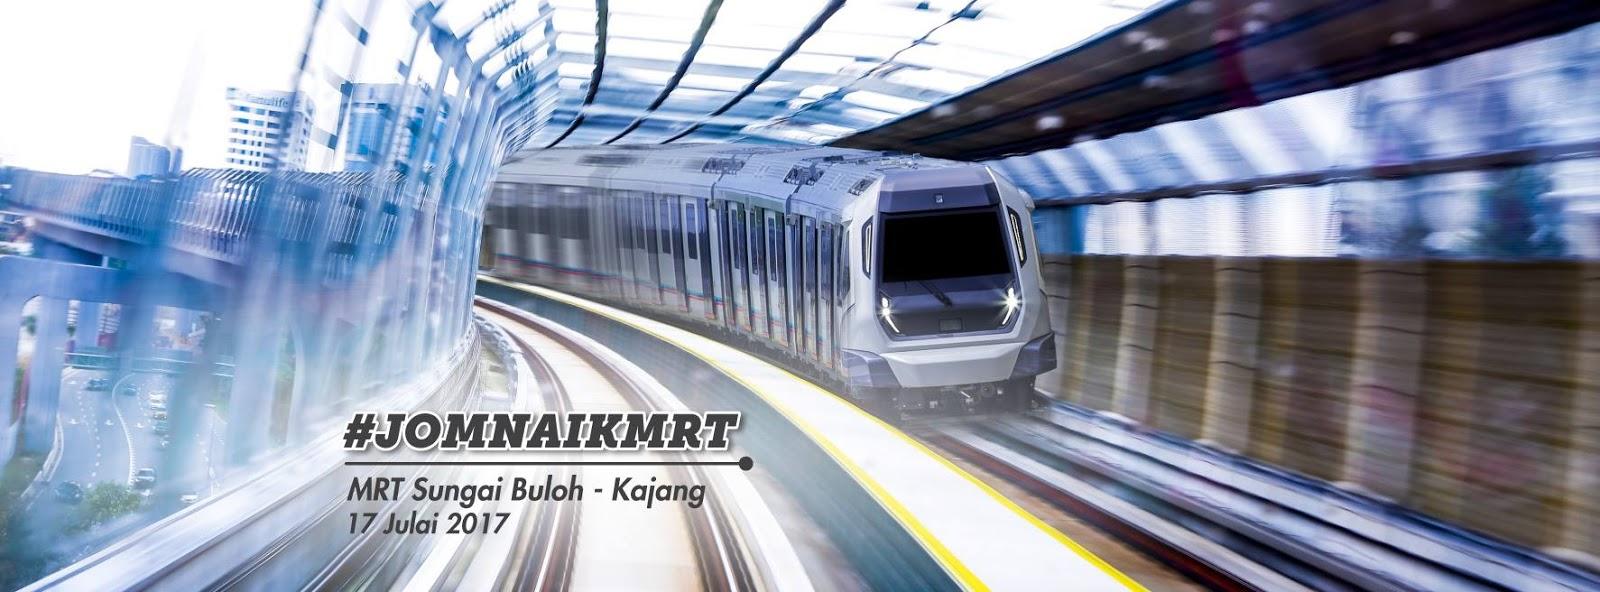 MRT Sungai Buloh - Kajang (SBK) Line #JomNaikMRT